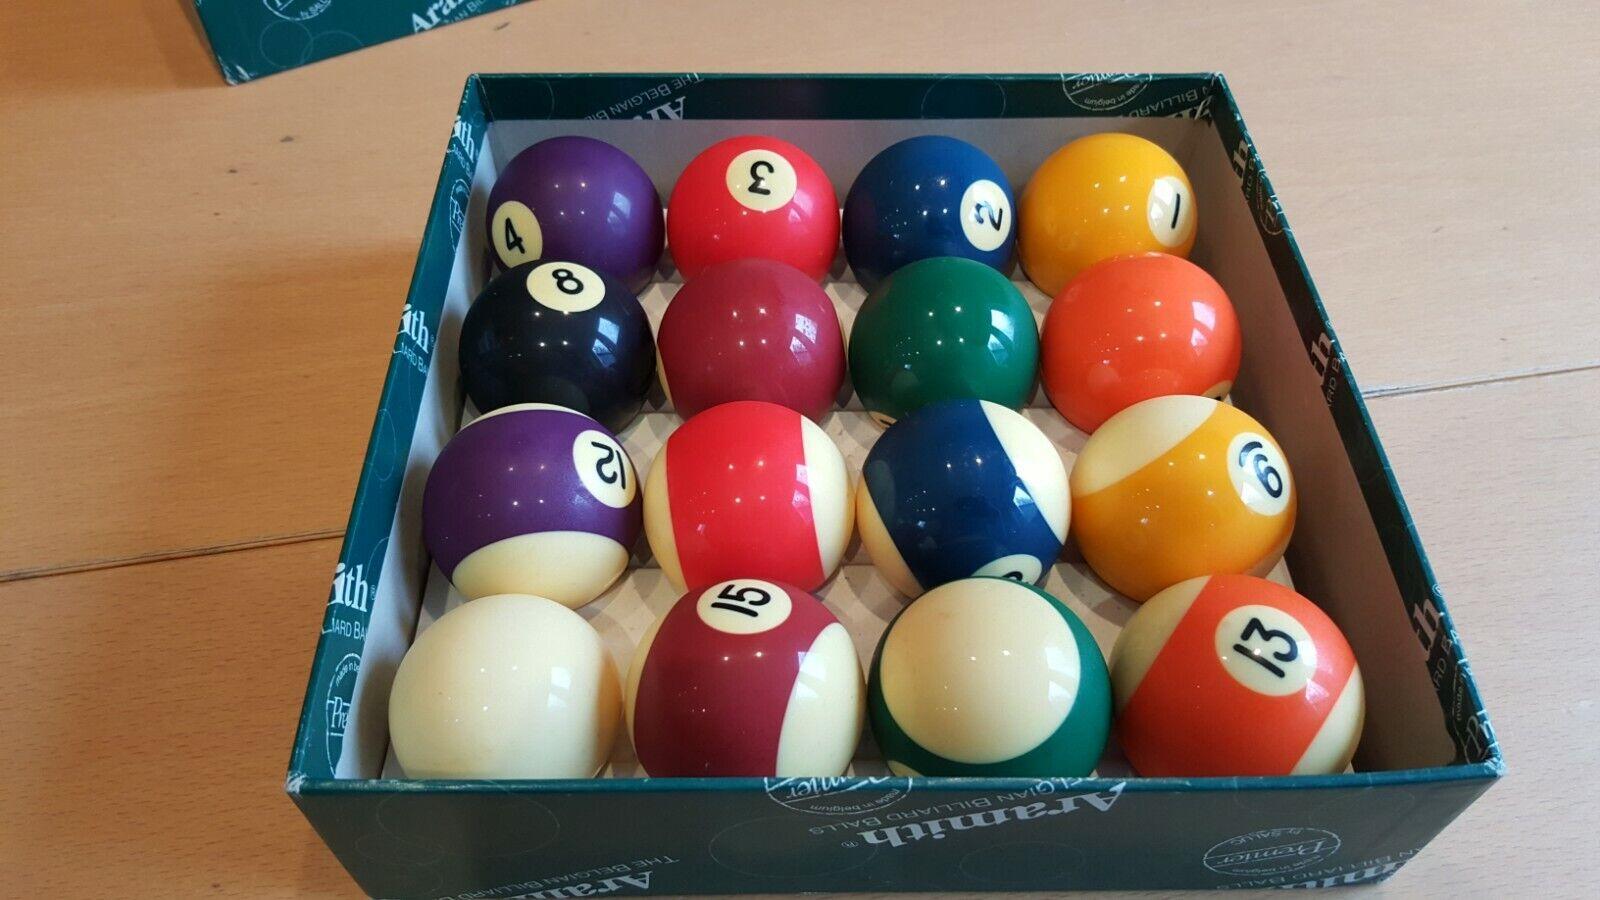 Aramith Billiard Balls set, 2